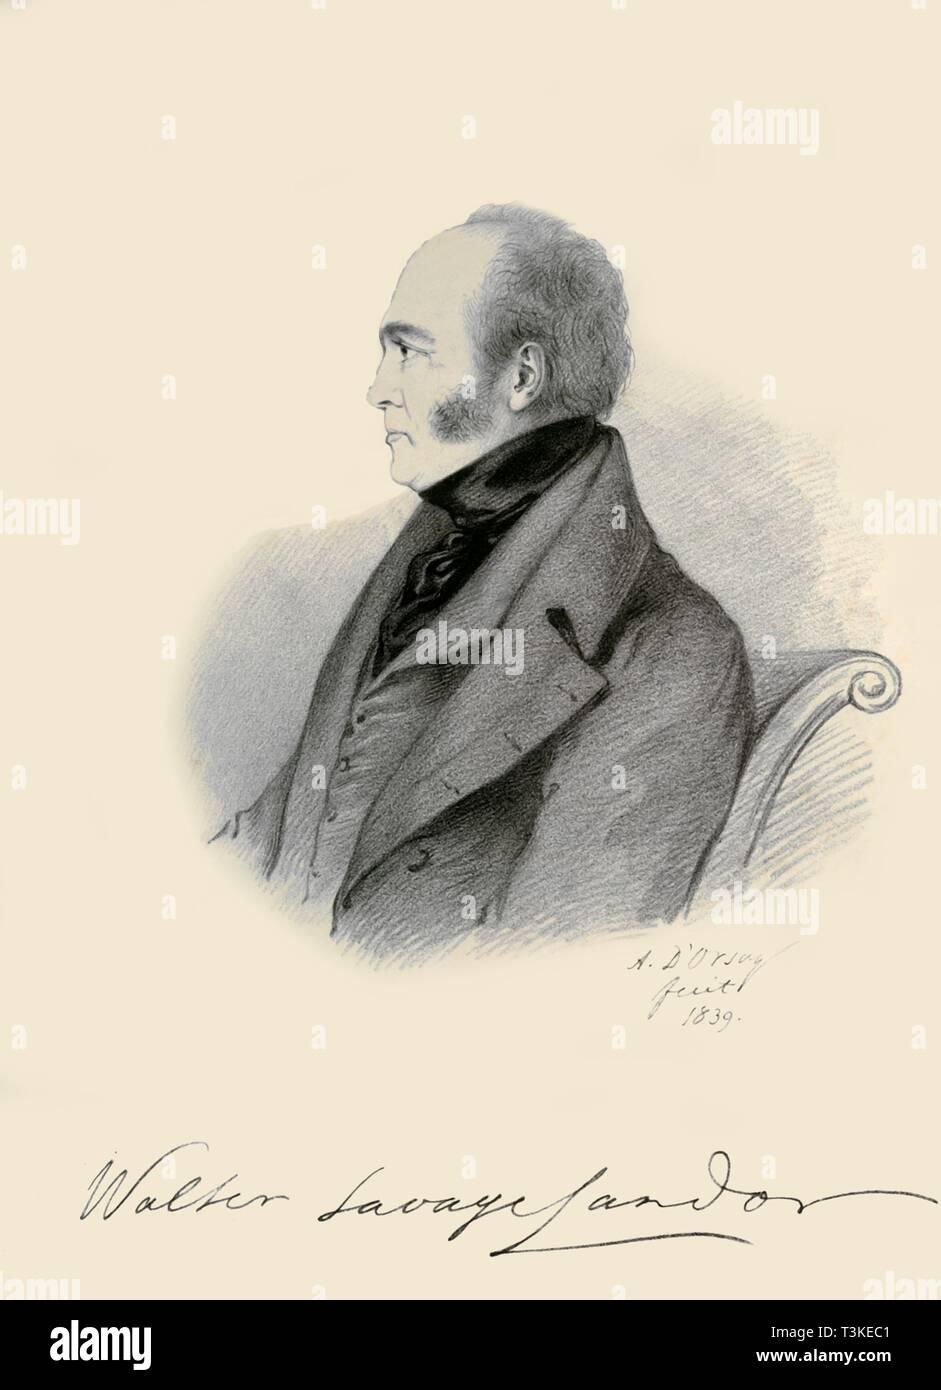 'Walter Savage Landor', 1839. Creators: Alfred d'Orsay, Richard James Lane. - Stock Image